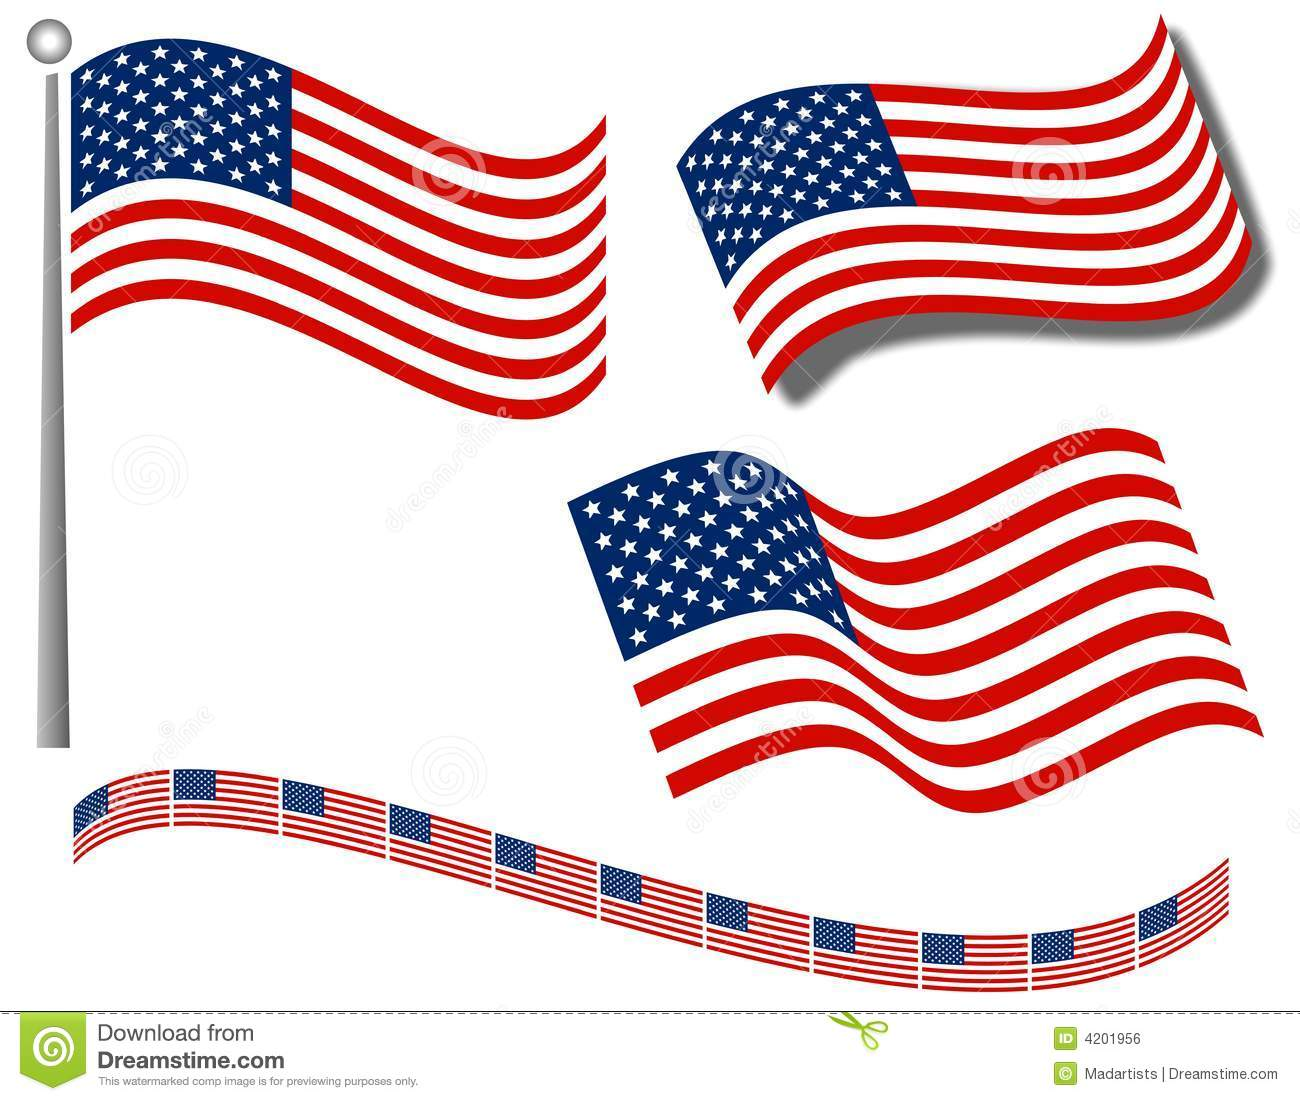 Flag Clip Art Free Downloads | Clipart Panda - Free Clipart Images